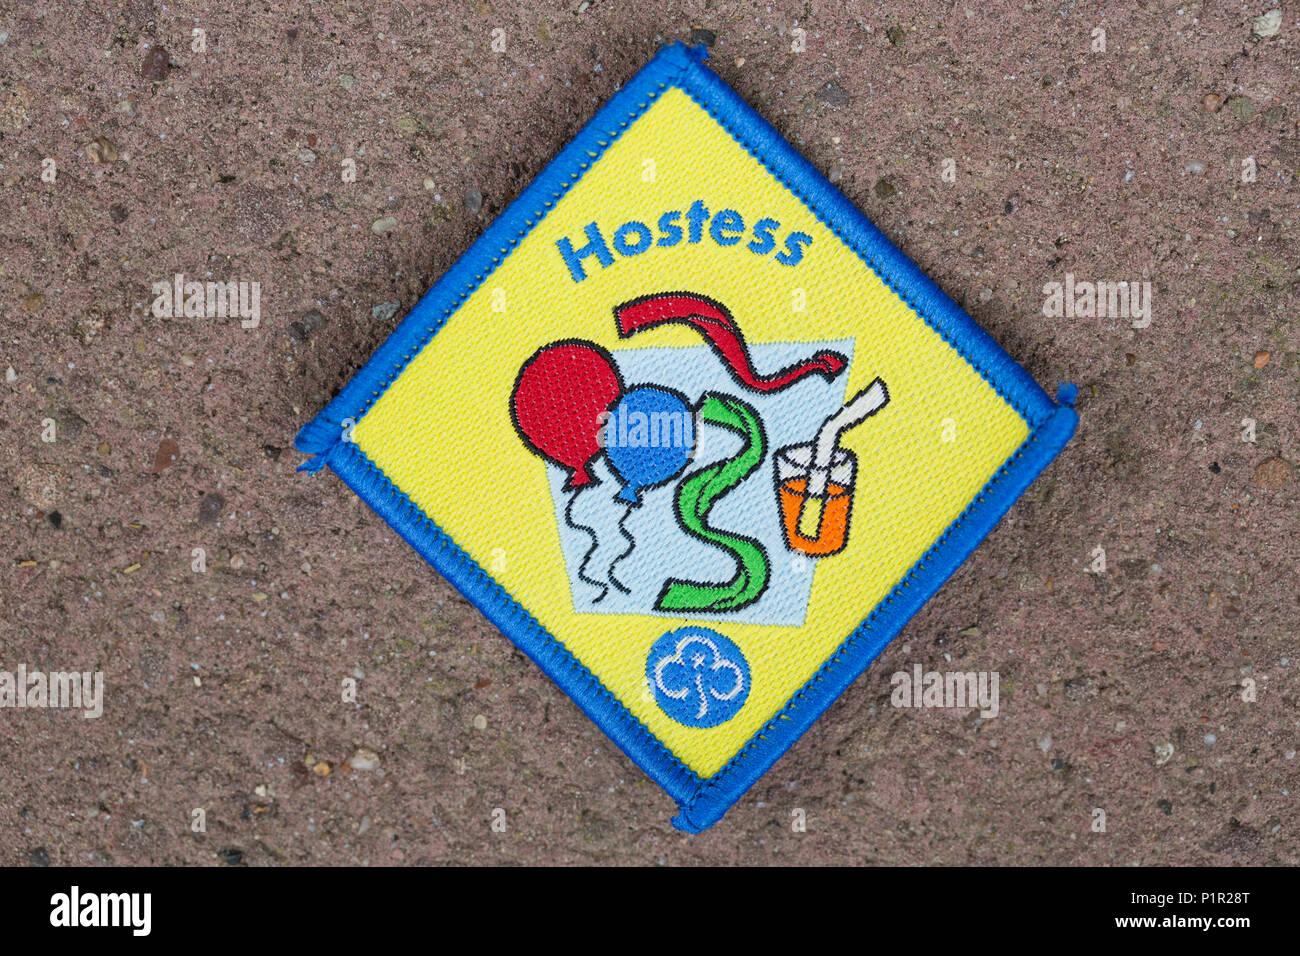 Hostess Girl Guide Brownies Badge Stock Photo 207645784 Alamy